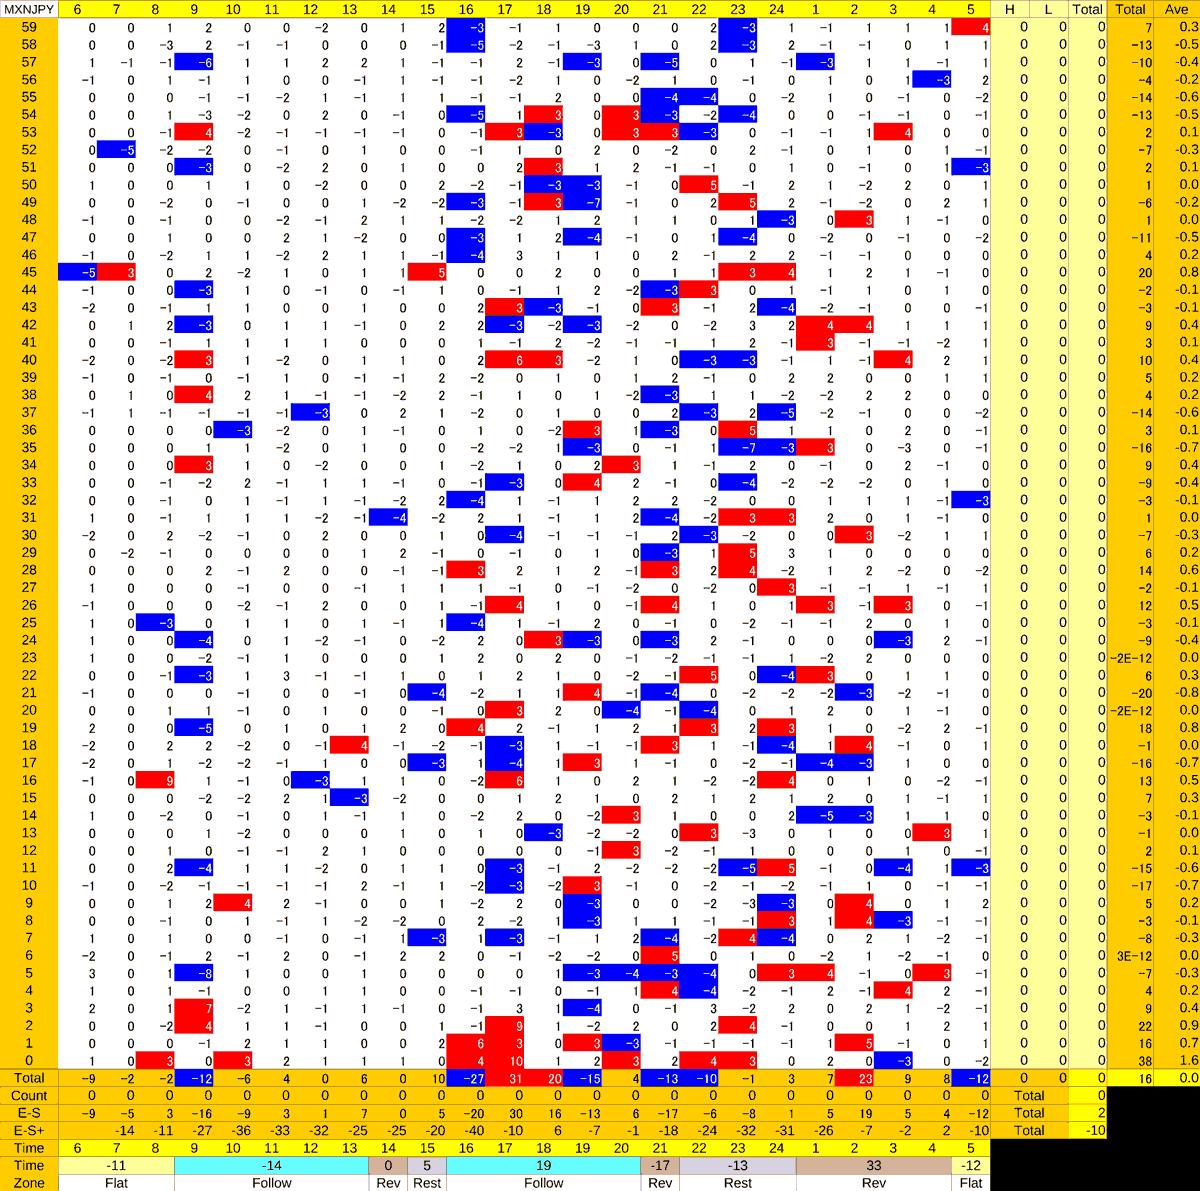 20201110_HS(3)MXNJPY